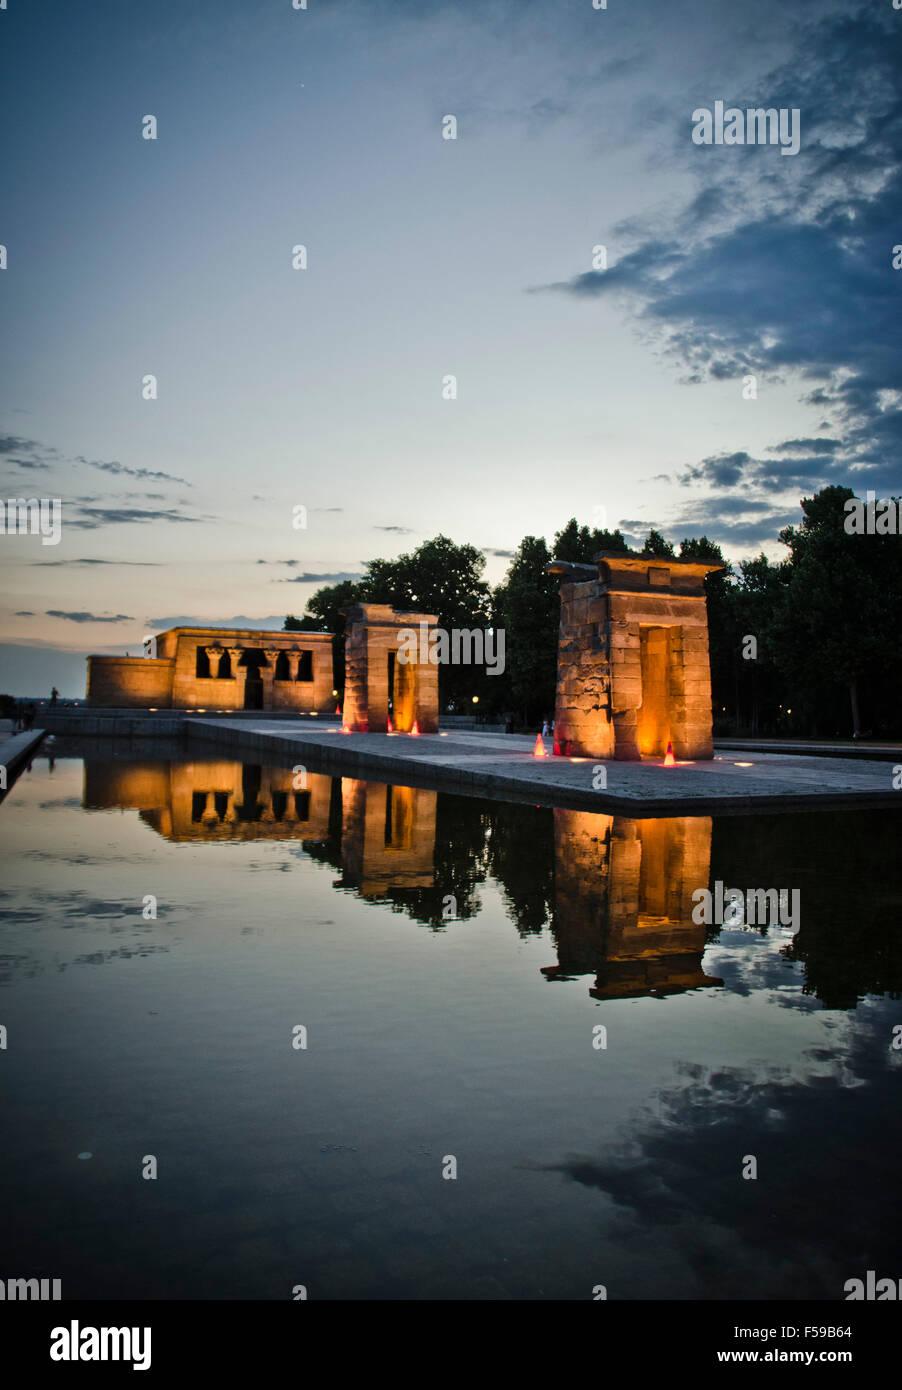 Templo de Debod, Madrid, Spain - Stock Image